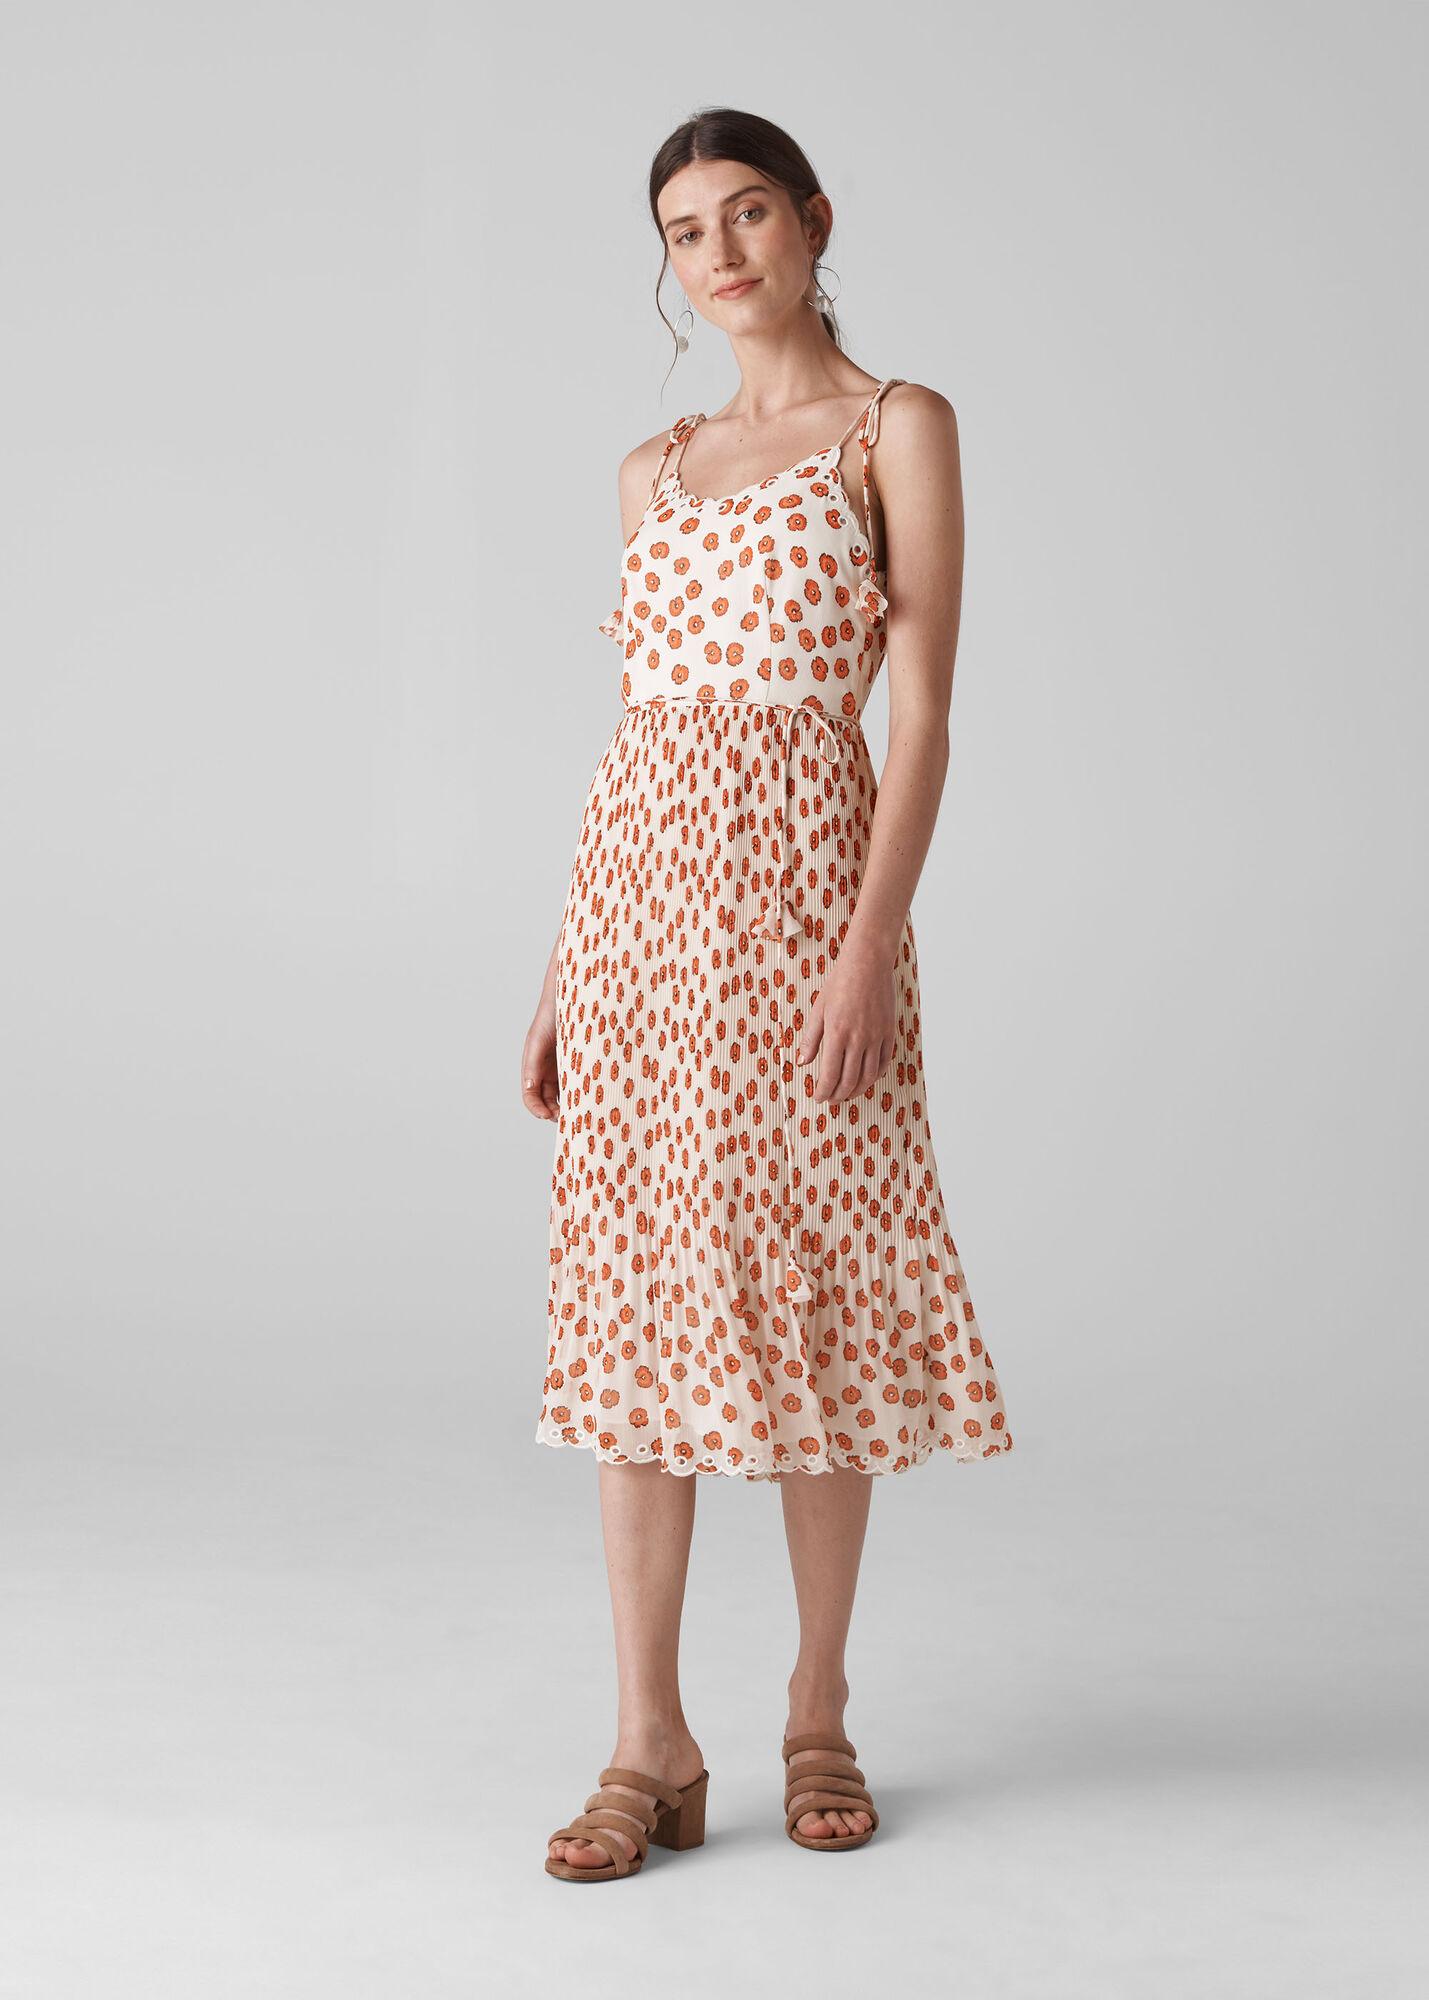 Salome Lenno Print Dress